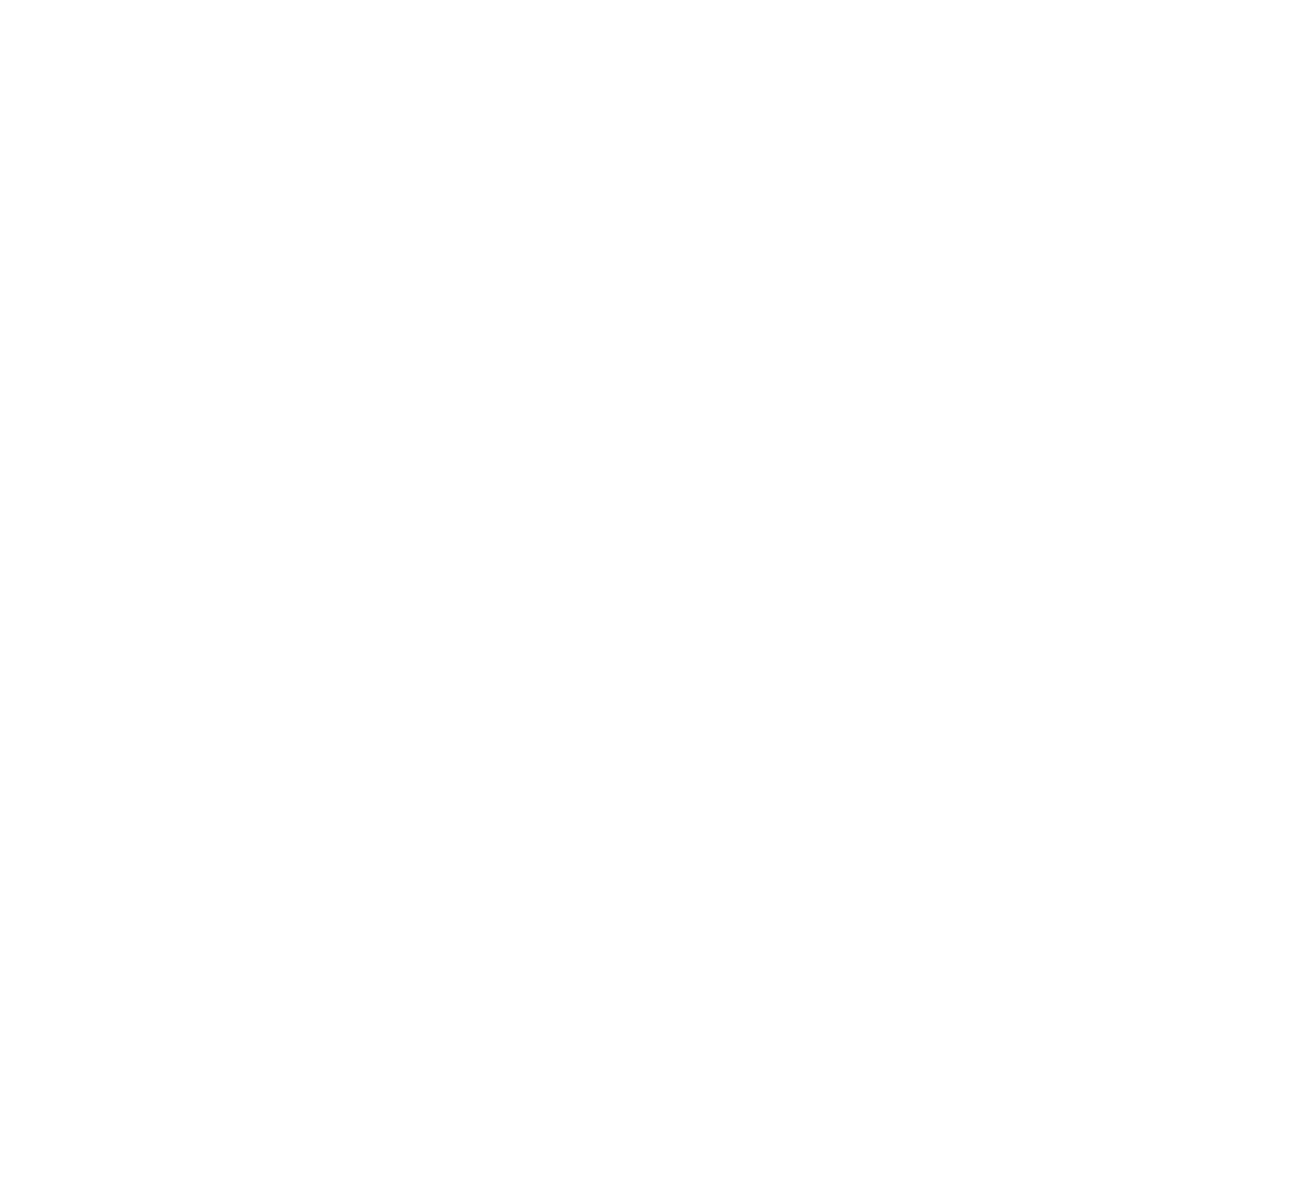 manke-chile-logo-blanco